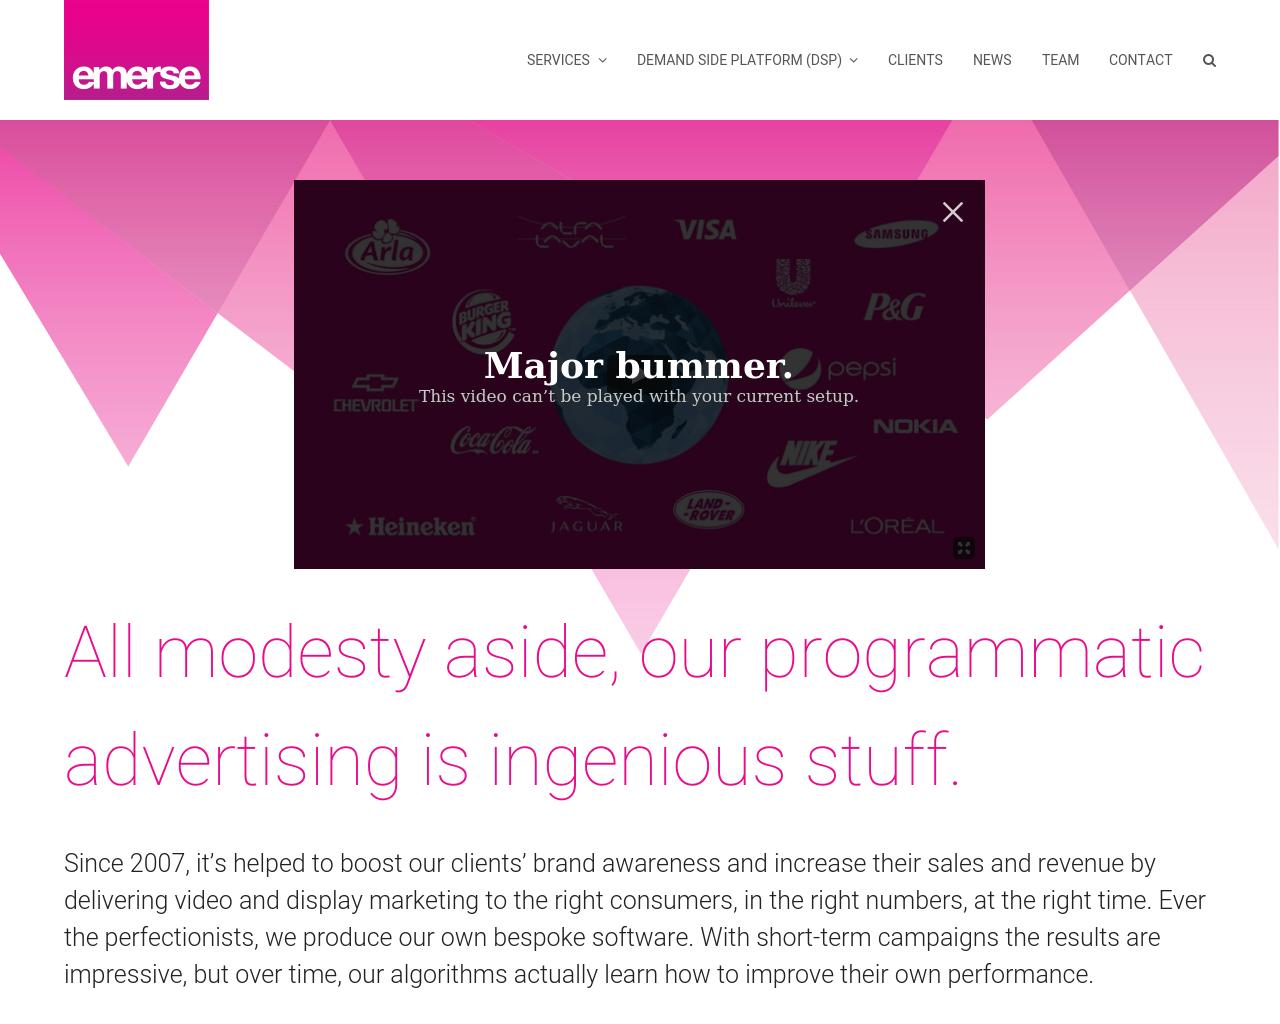 Emerse.com-Advertising-Reviews-Pricing